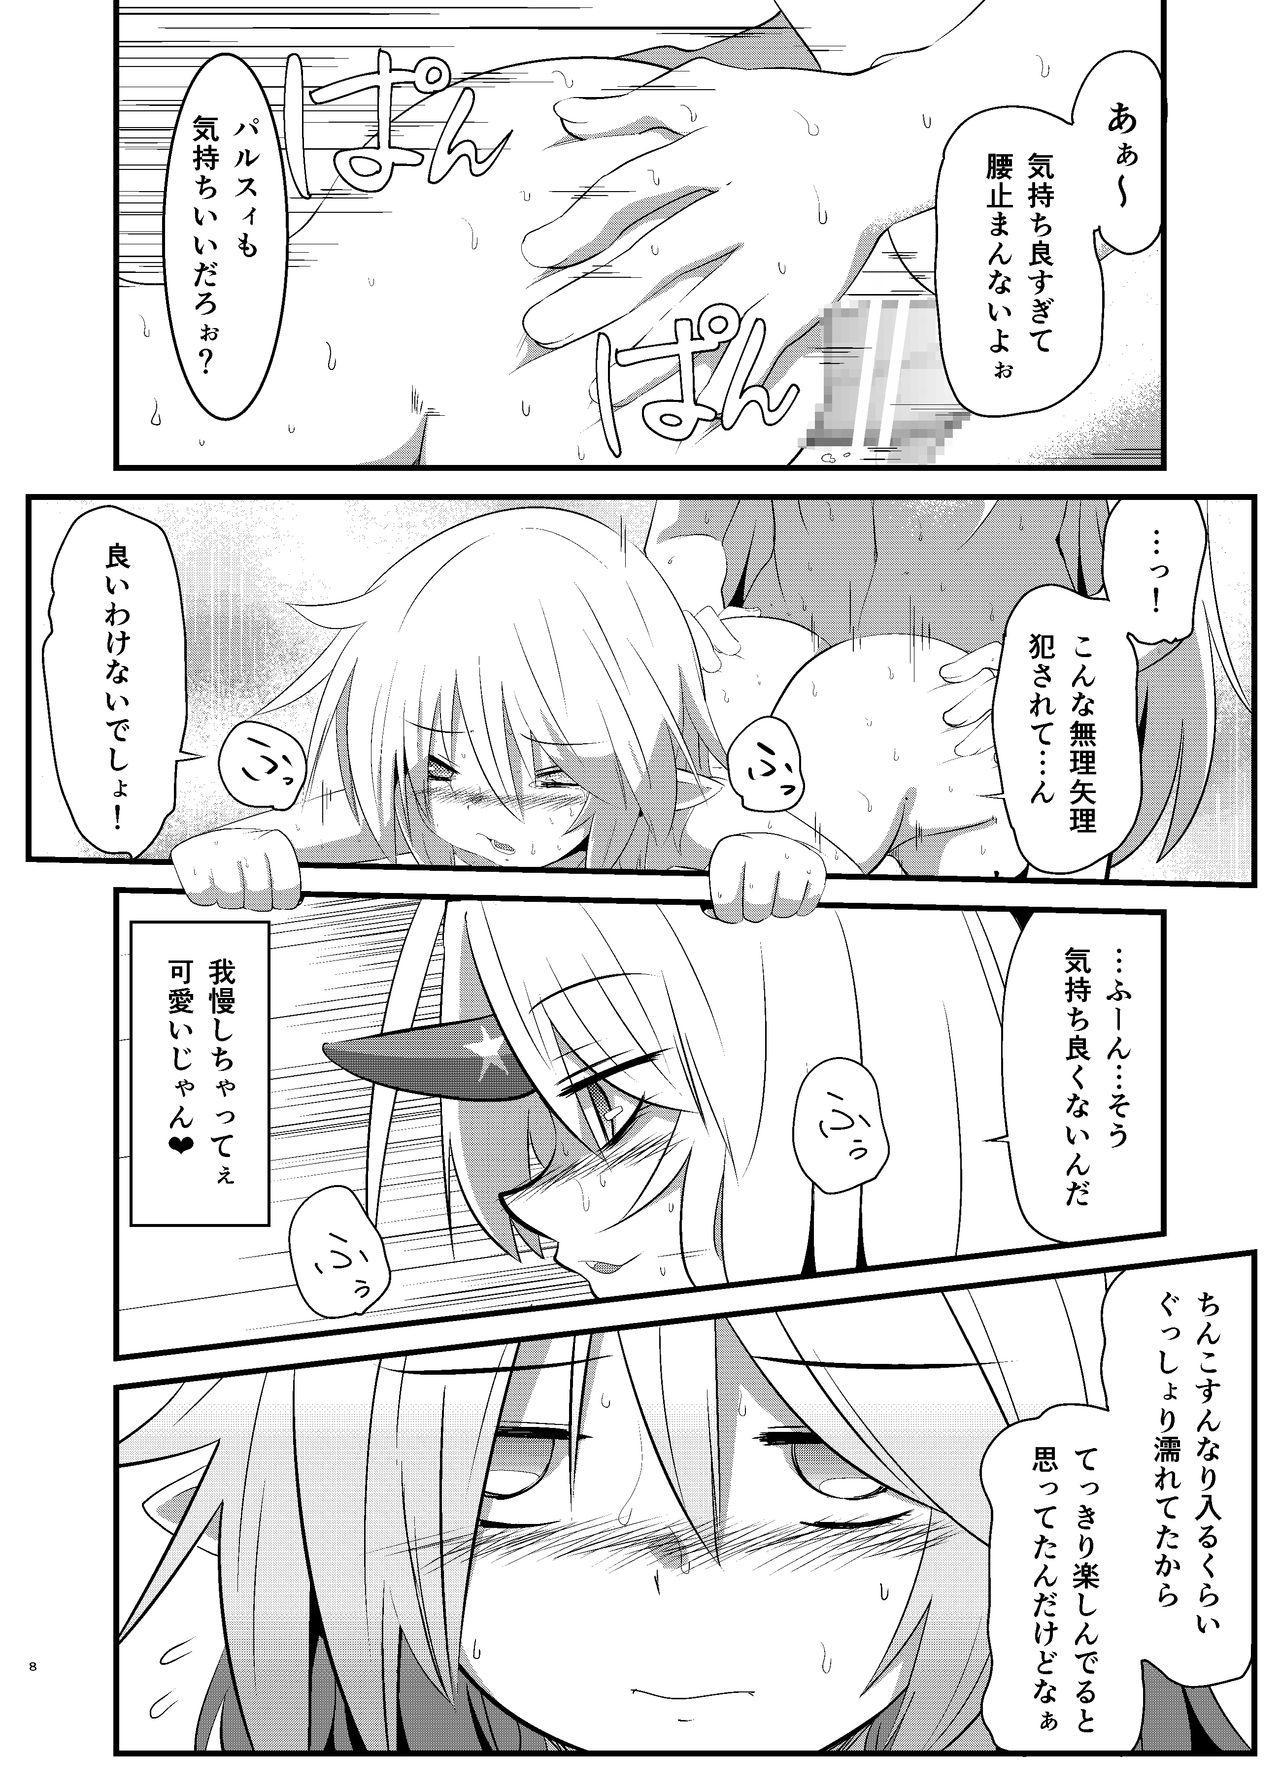 Yurushite Hashihime-sama 7